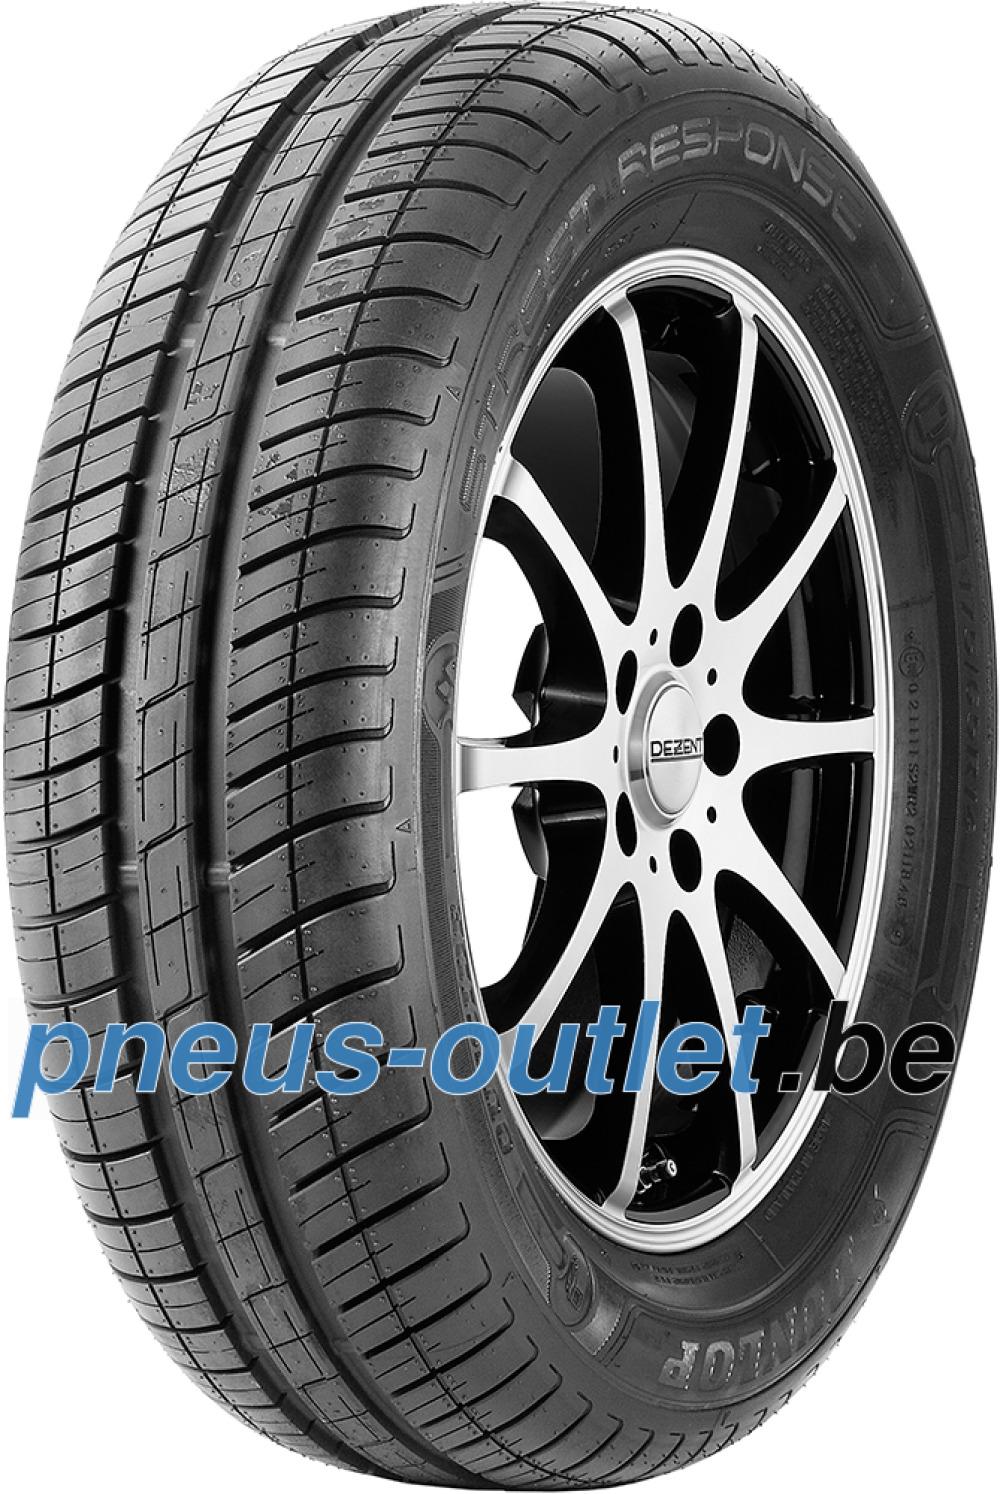 Dunlop SP StreetResponse 2 ( 165/70 R14 85T XL )